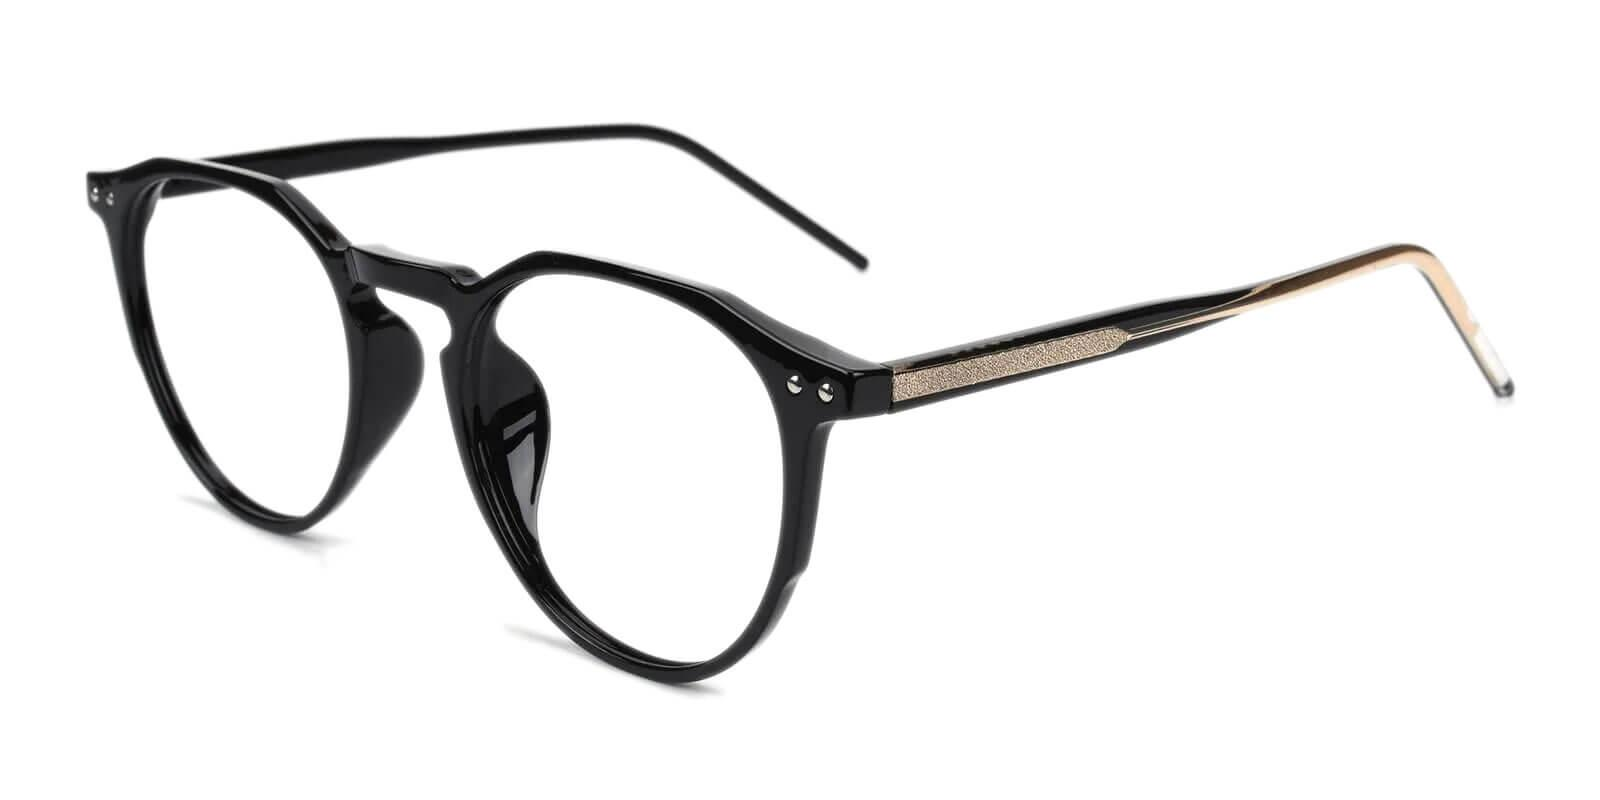 Mariner Black Acetate Eyeglasses , SpringHinges , UniversalBridgeFit Frames from ABBE Glasses